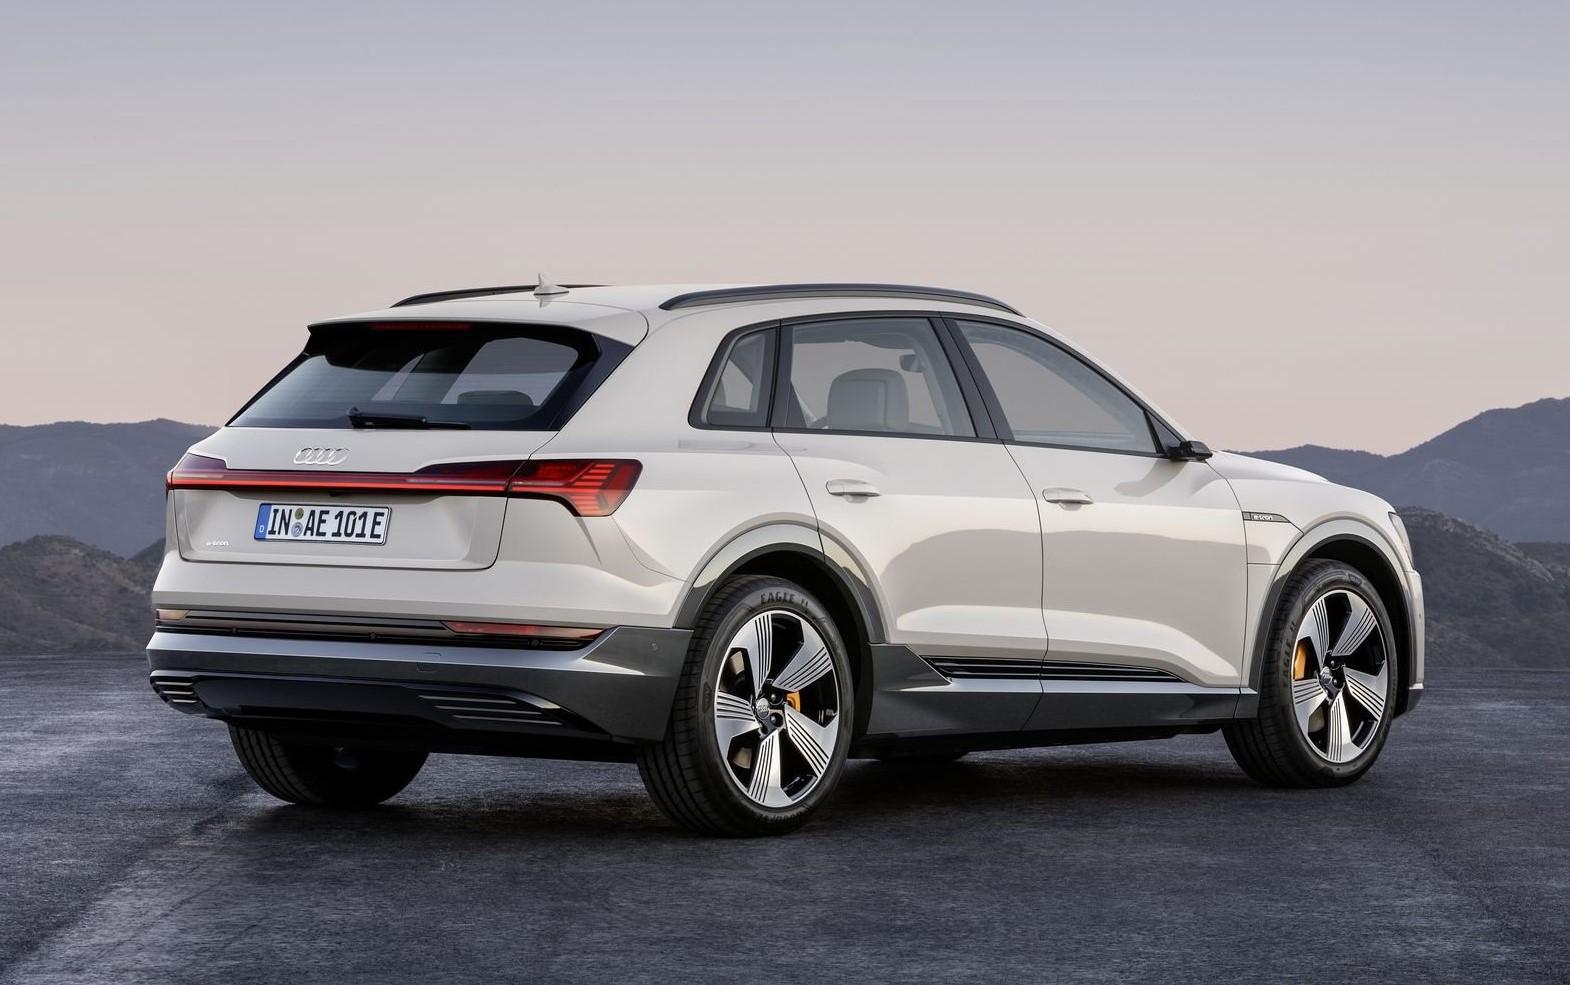 Audi E-tron suv range